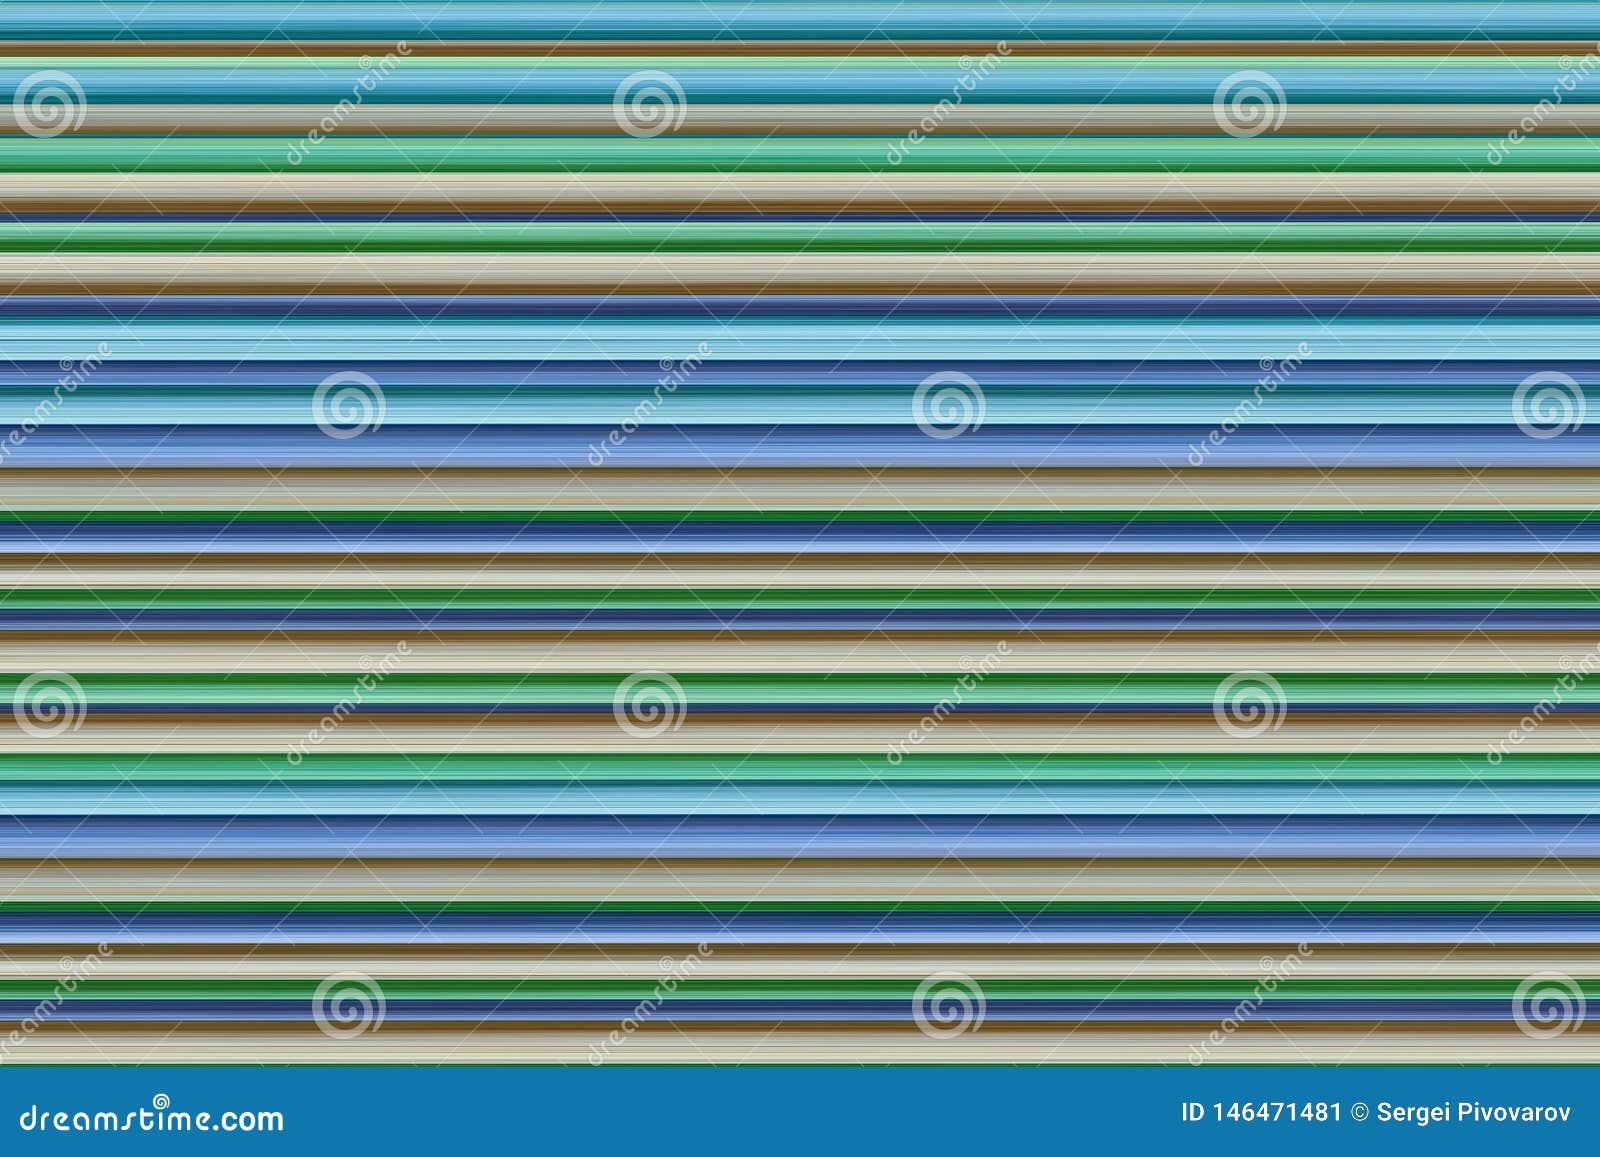 Striped background blue lilac beige green stripes colorful base design art horizontal